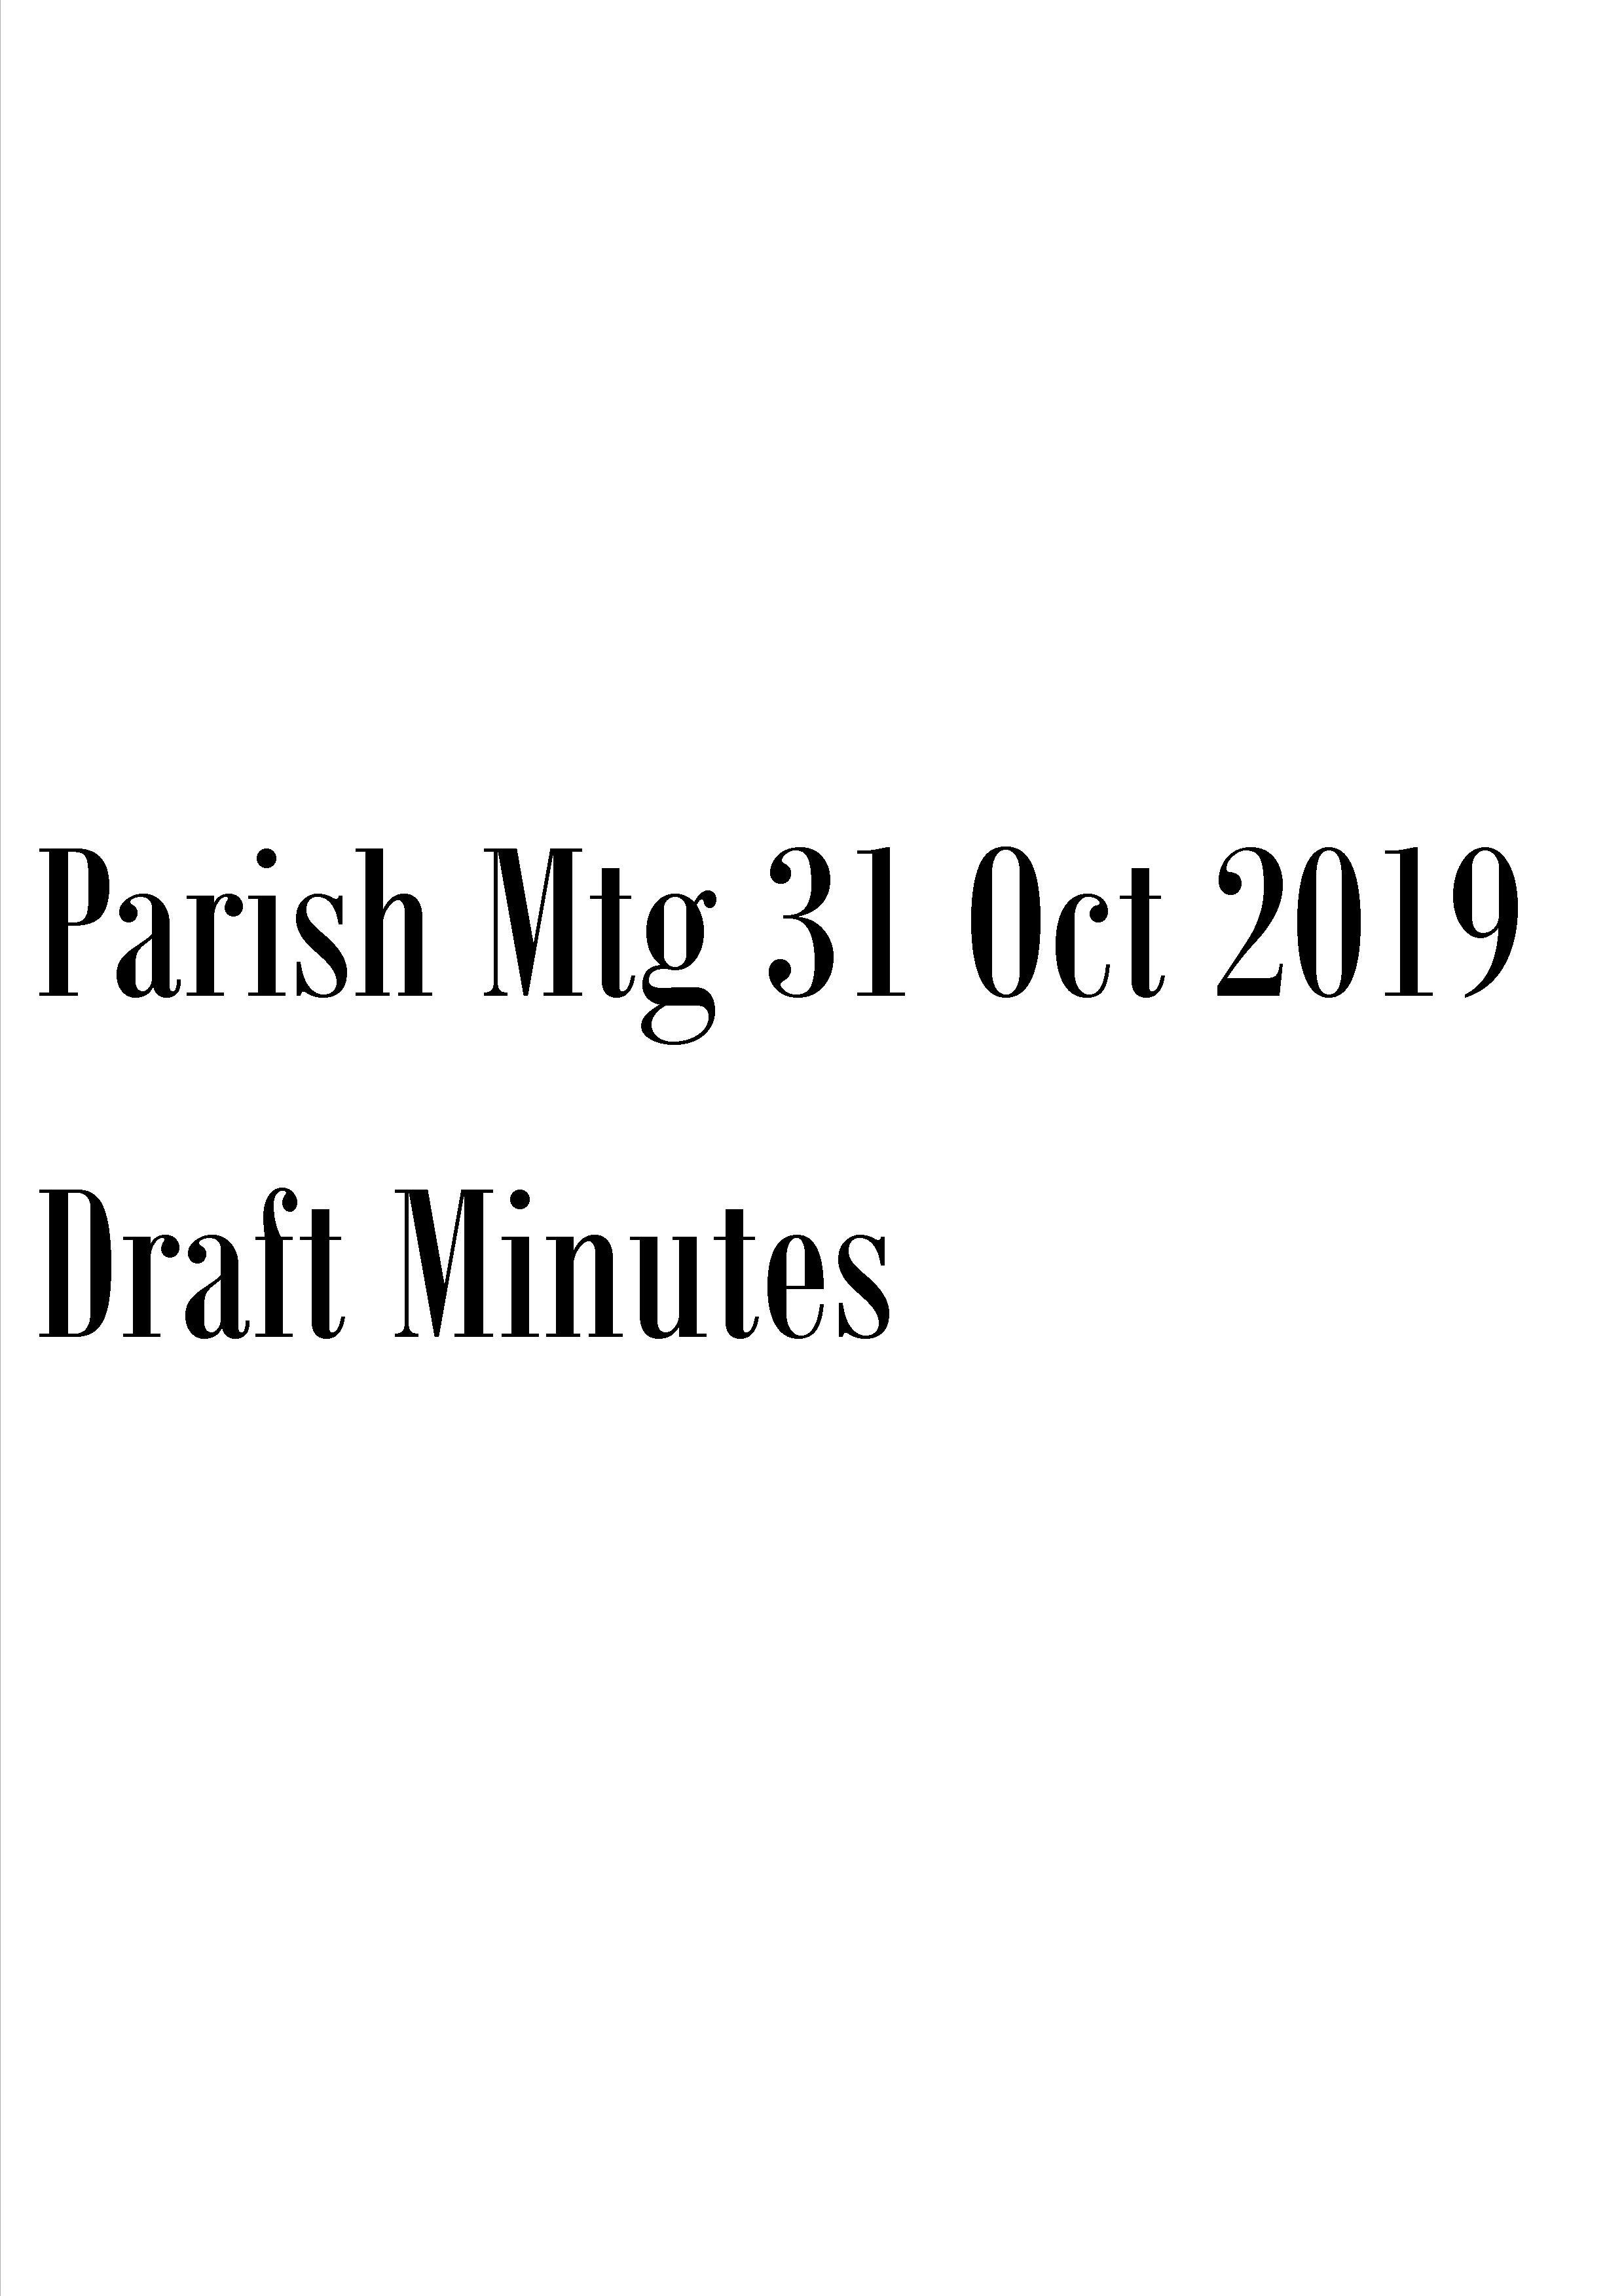 Draft Minutes Oct 2019